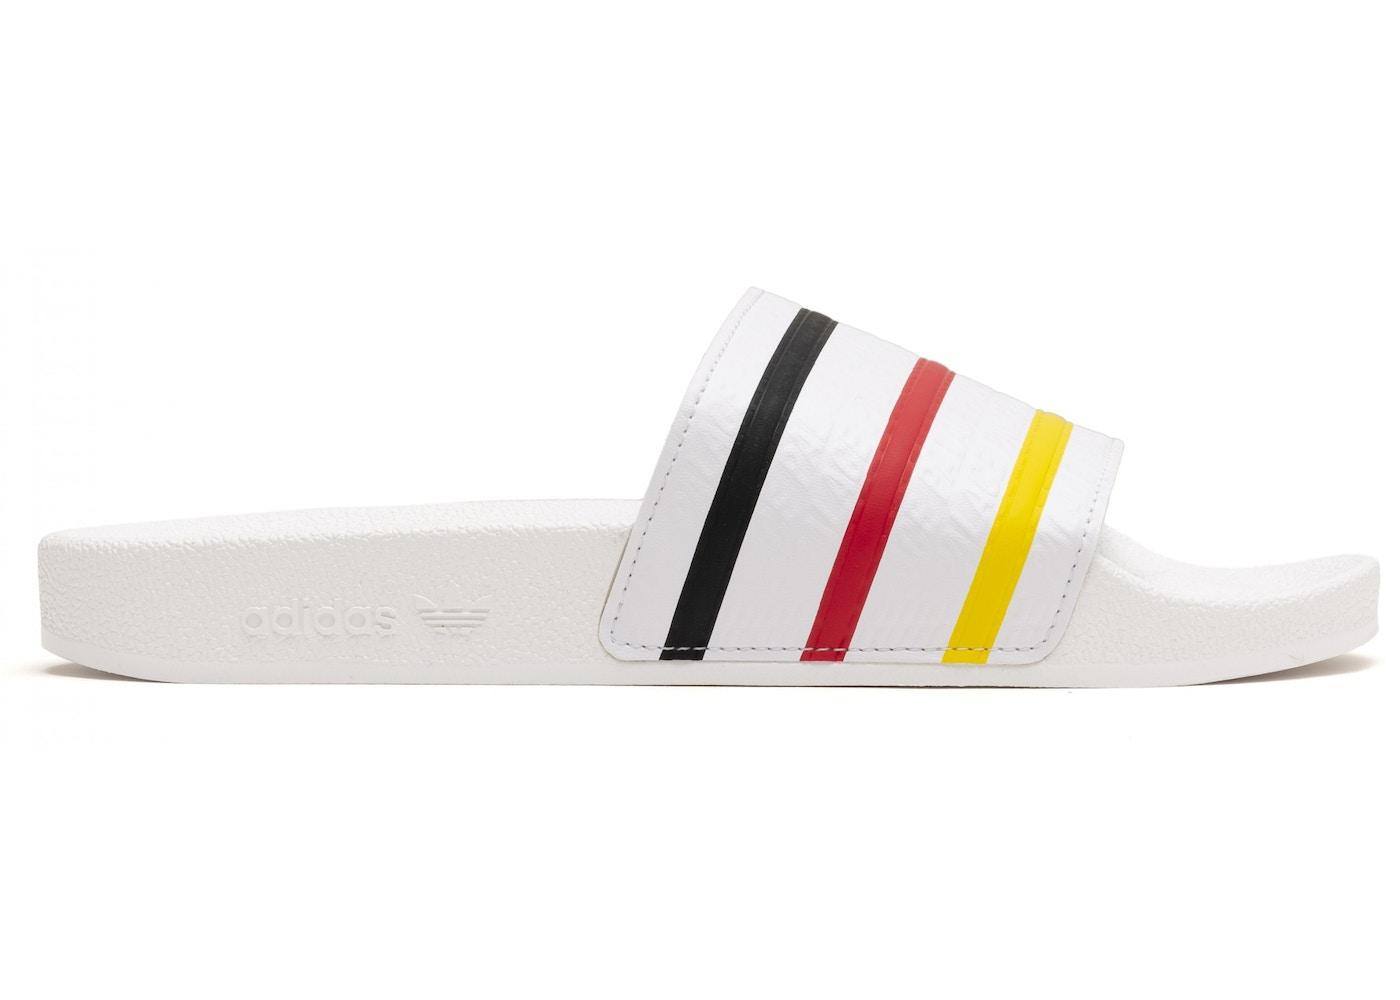 b5601ac1c24c0 adidas Adilette Slides - B41584